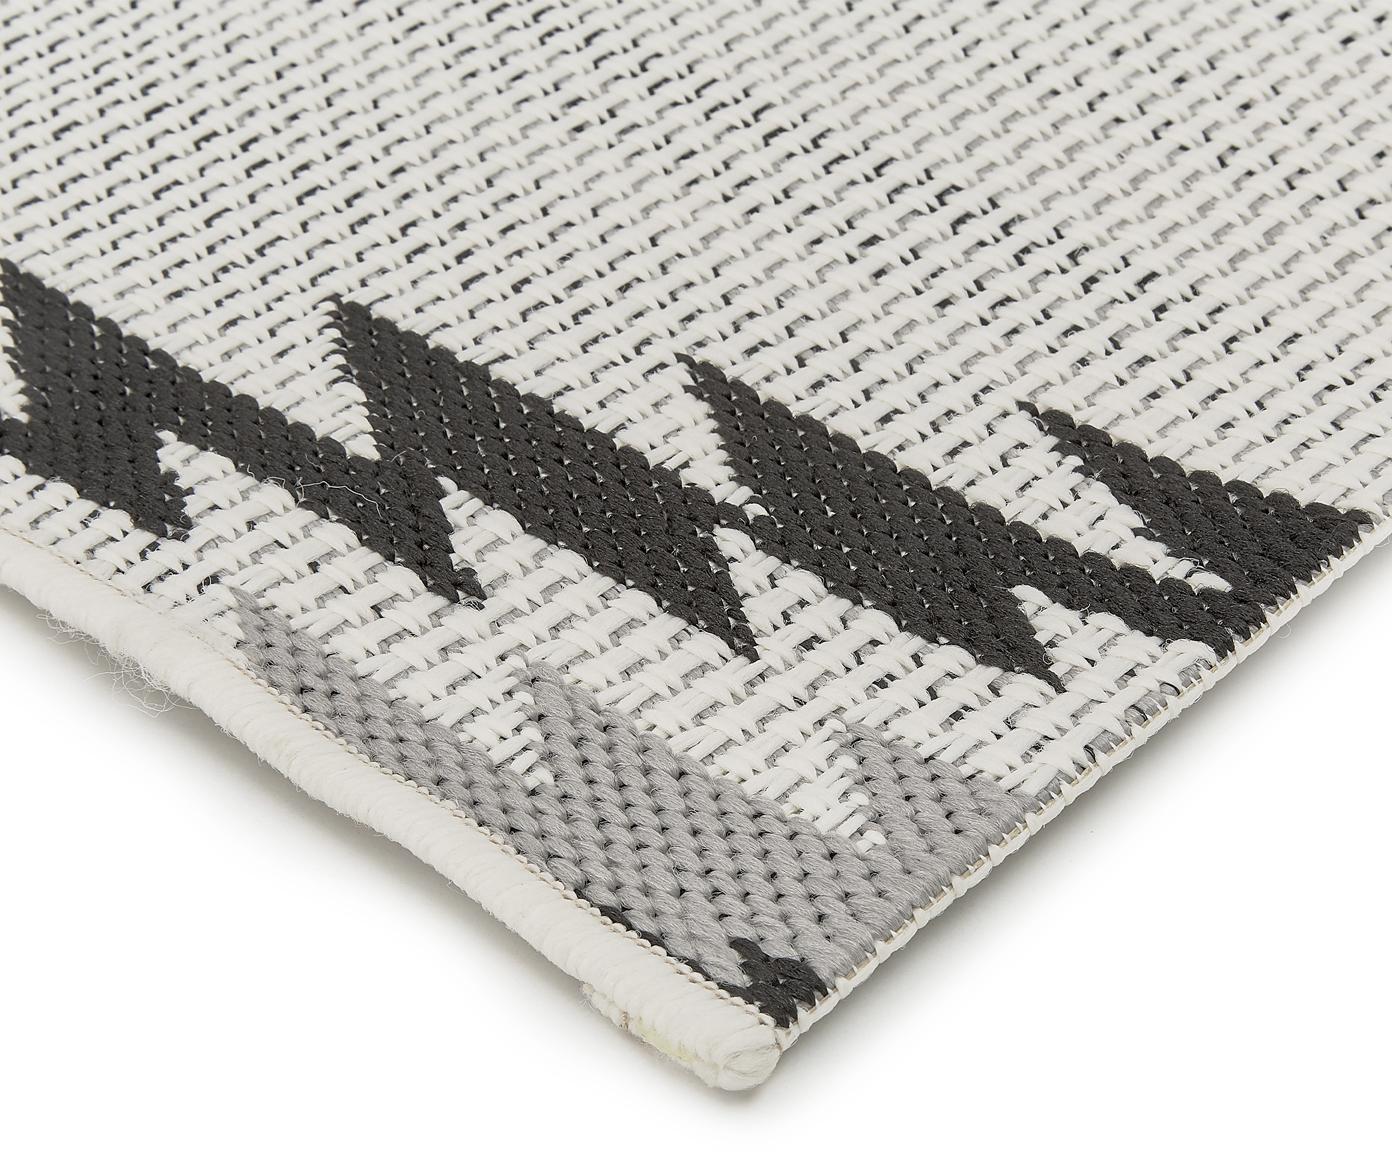 Alfombra de interior/exterior Ikat, Parte superior: polipropileno, Reverso: poliéster, Blanco, negro, gris, An 80 x L 250 cm